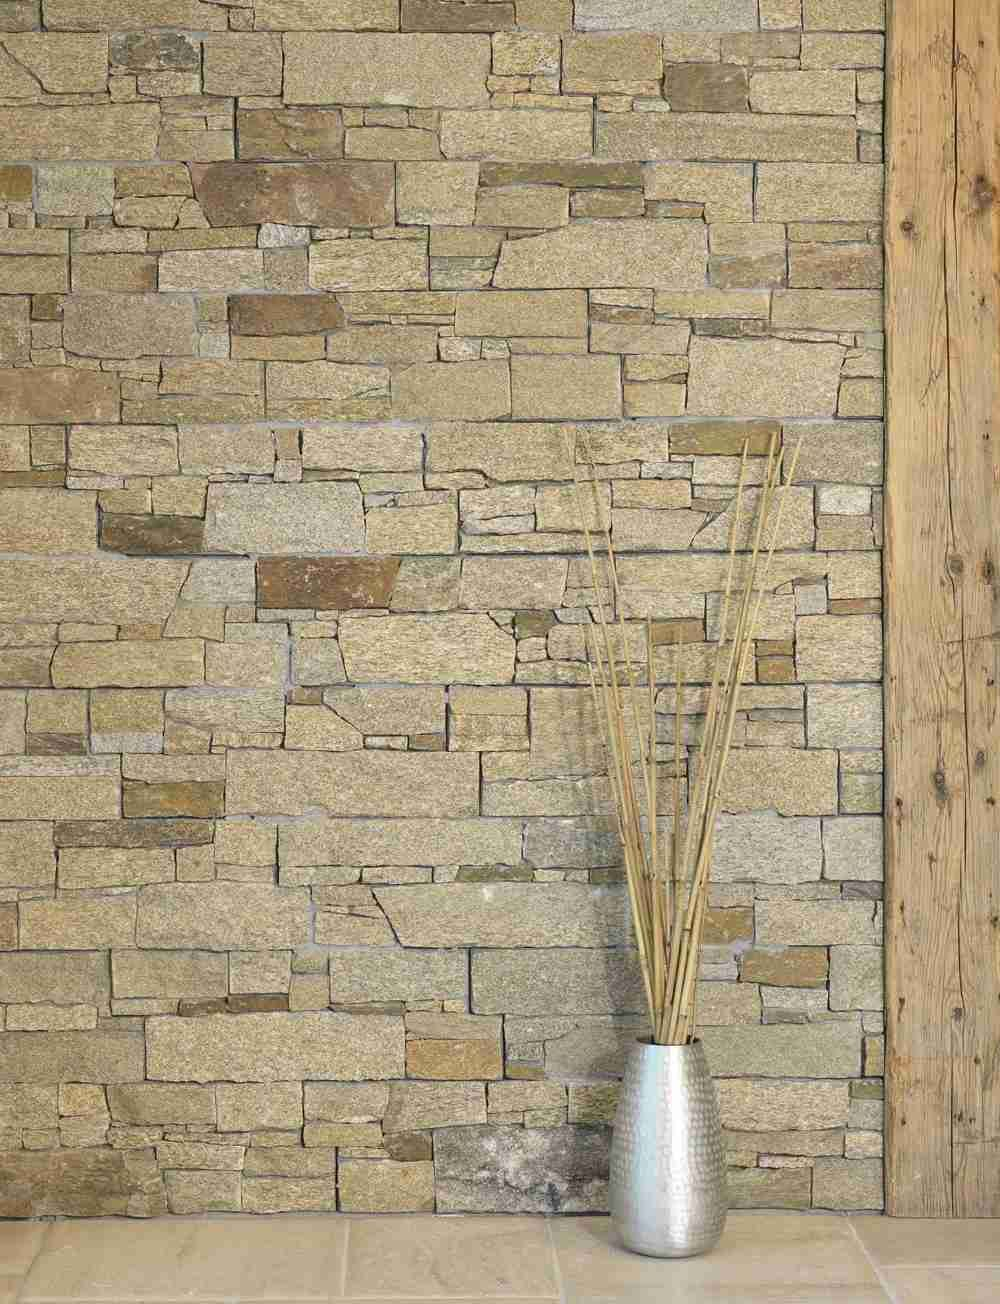 Pierre De Parement En Granit parement en pierre granit jaune negara | granit, pierre